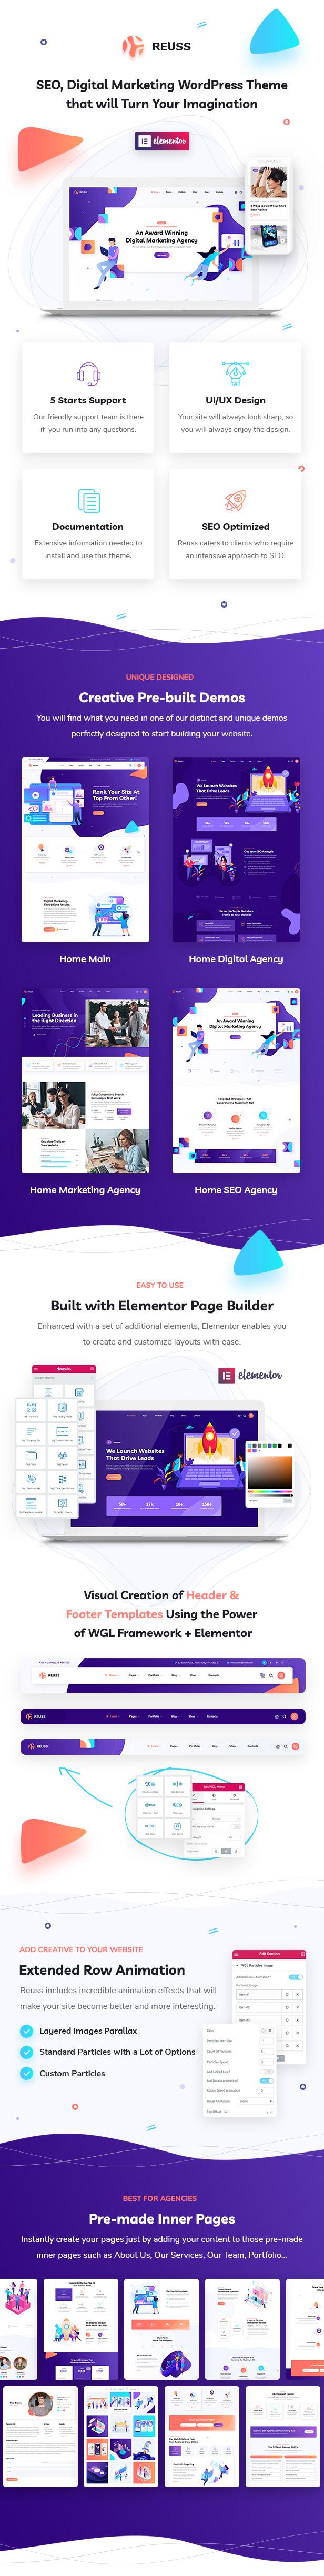 Reuss - SEO Marketing Agency WordPress Theme - 2